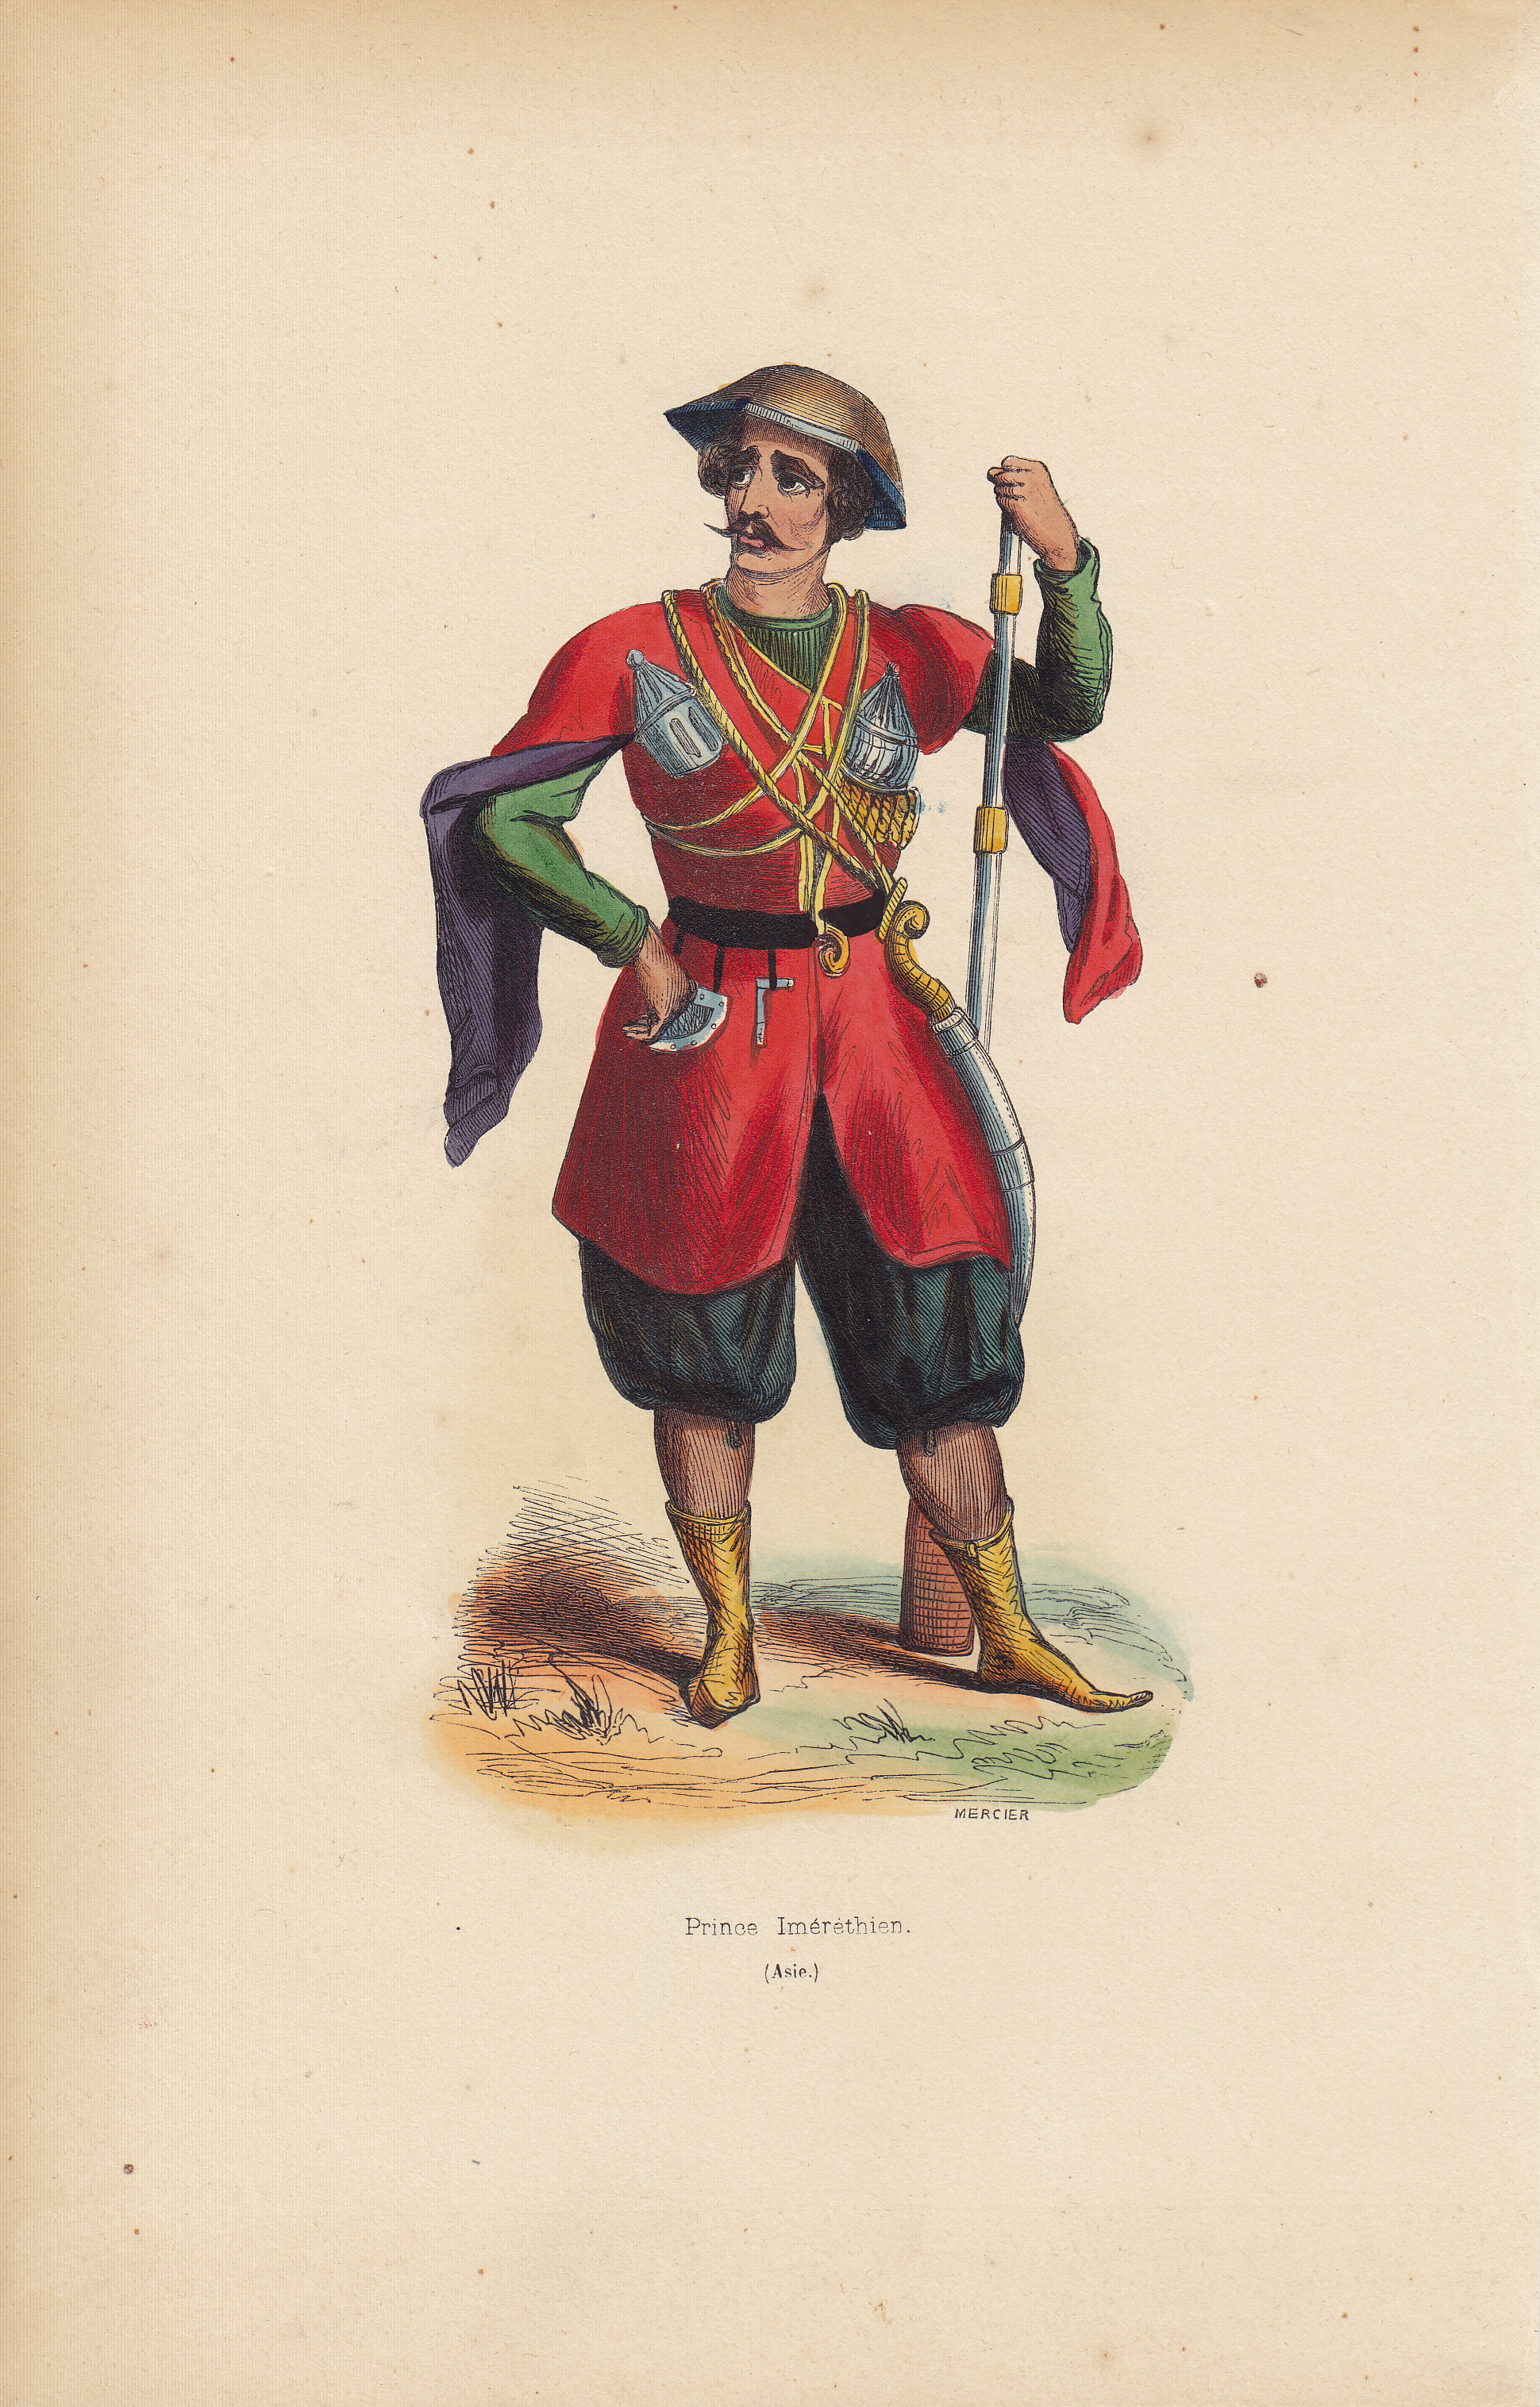 Prince Imerethien